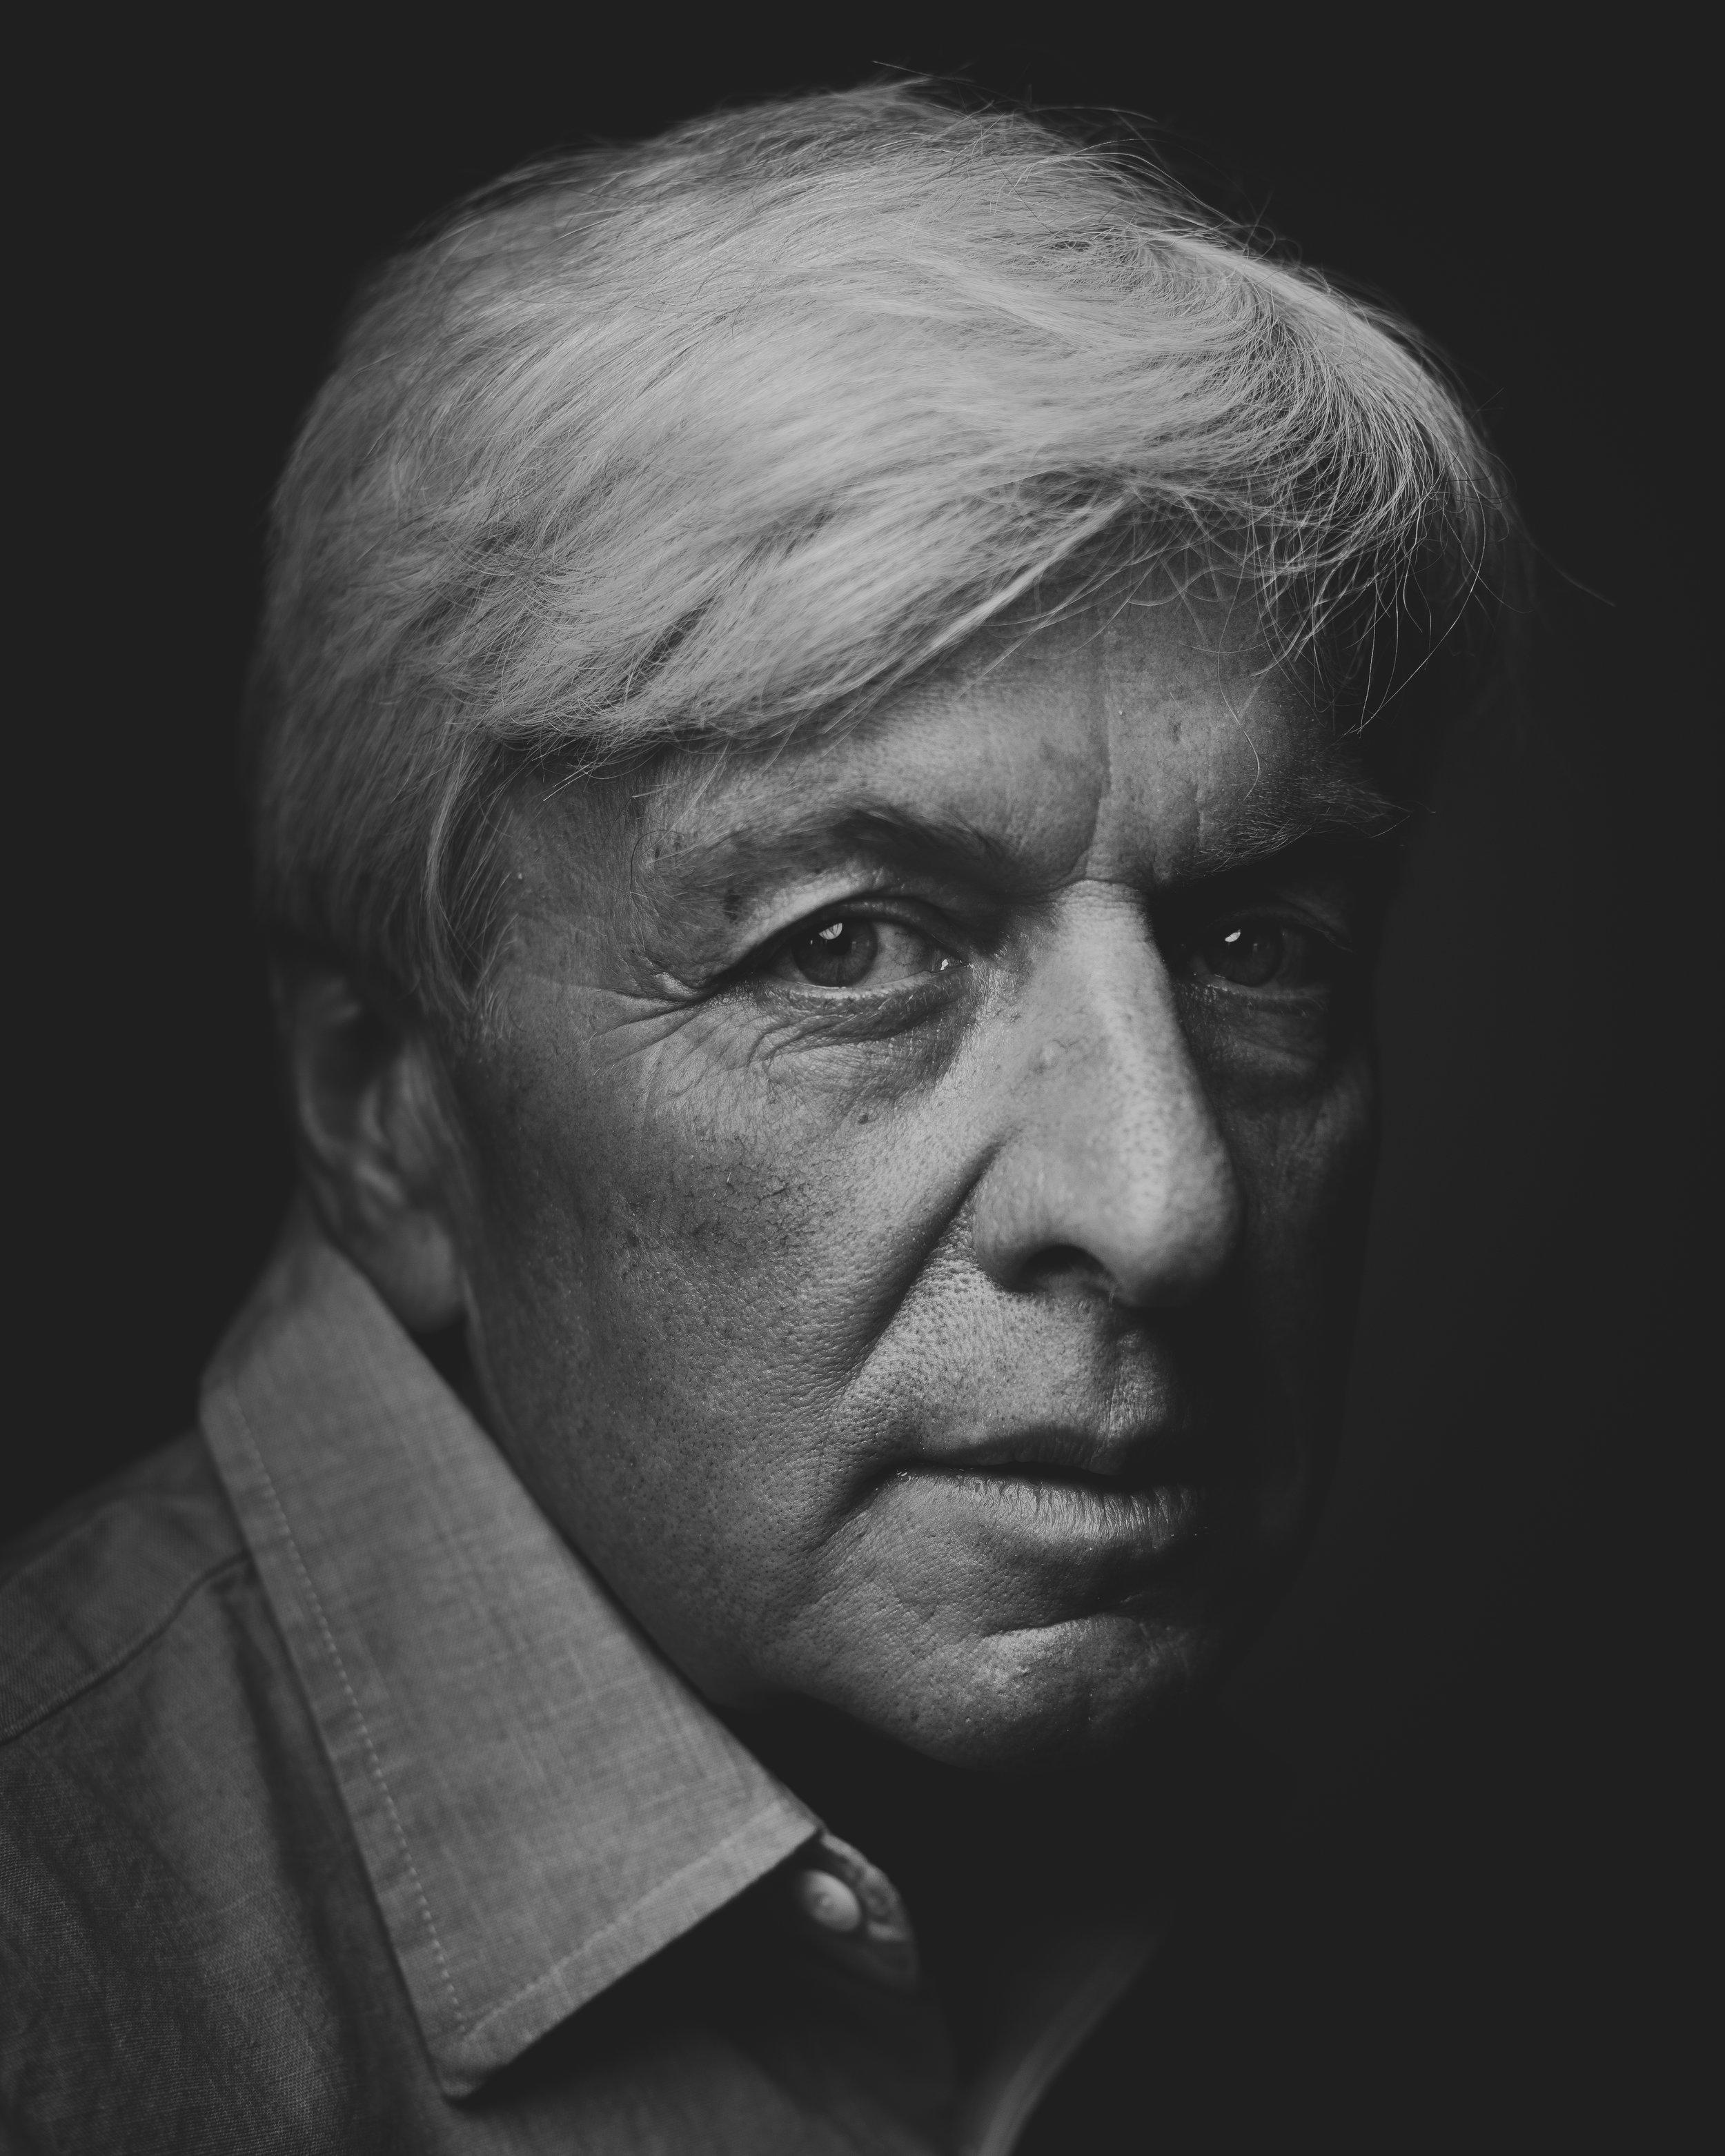 ©duston-todd-portrait-studio-older-man.jpg